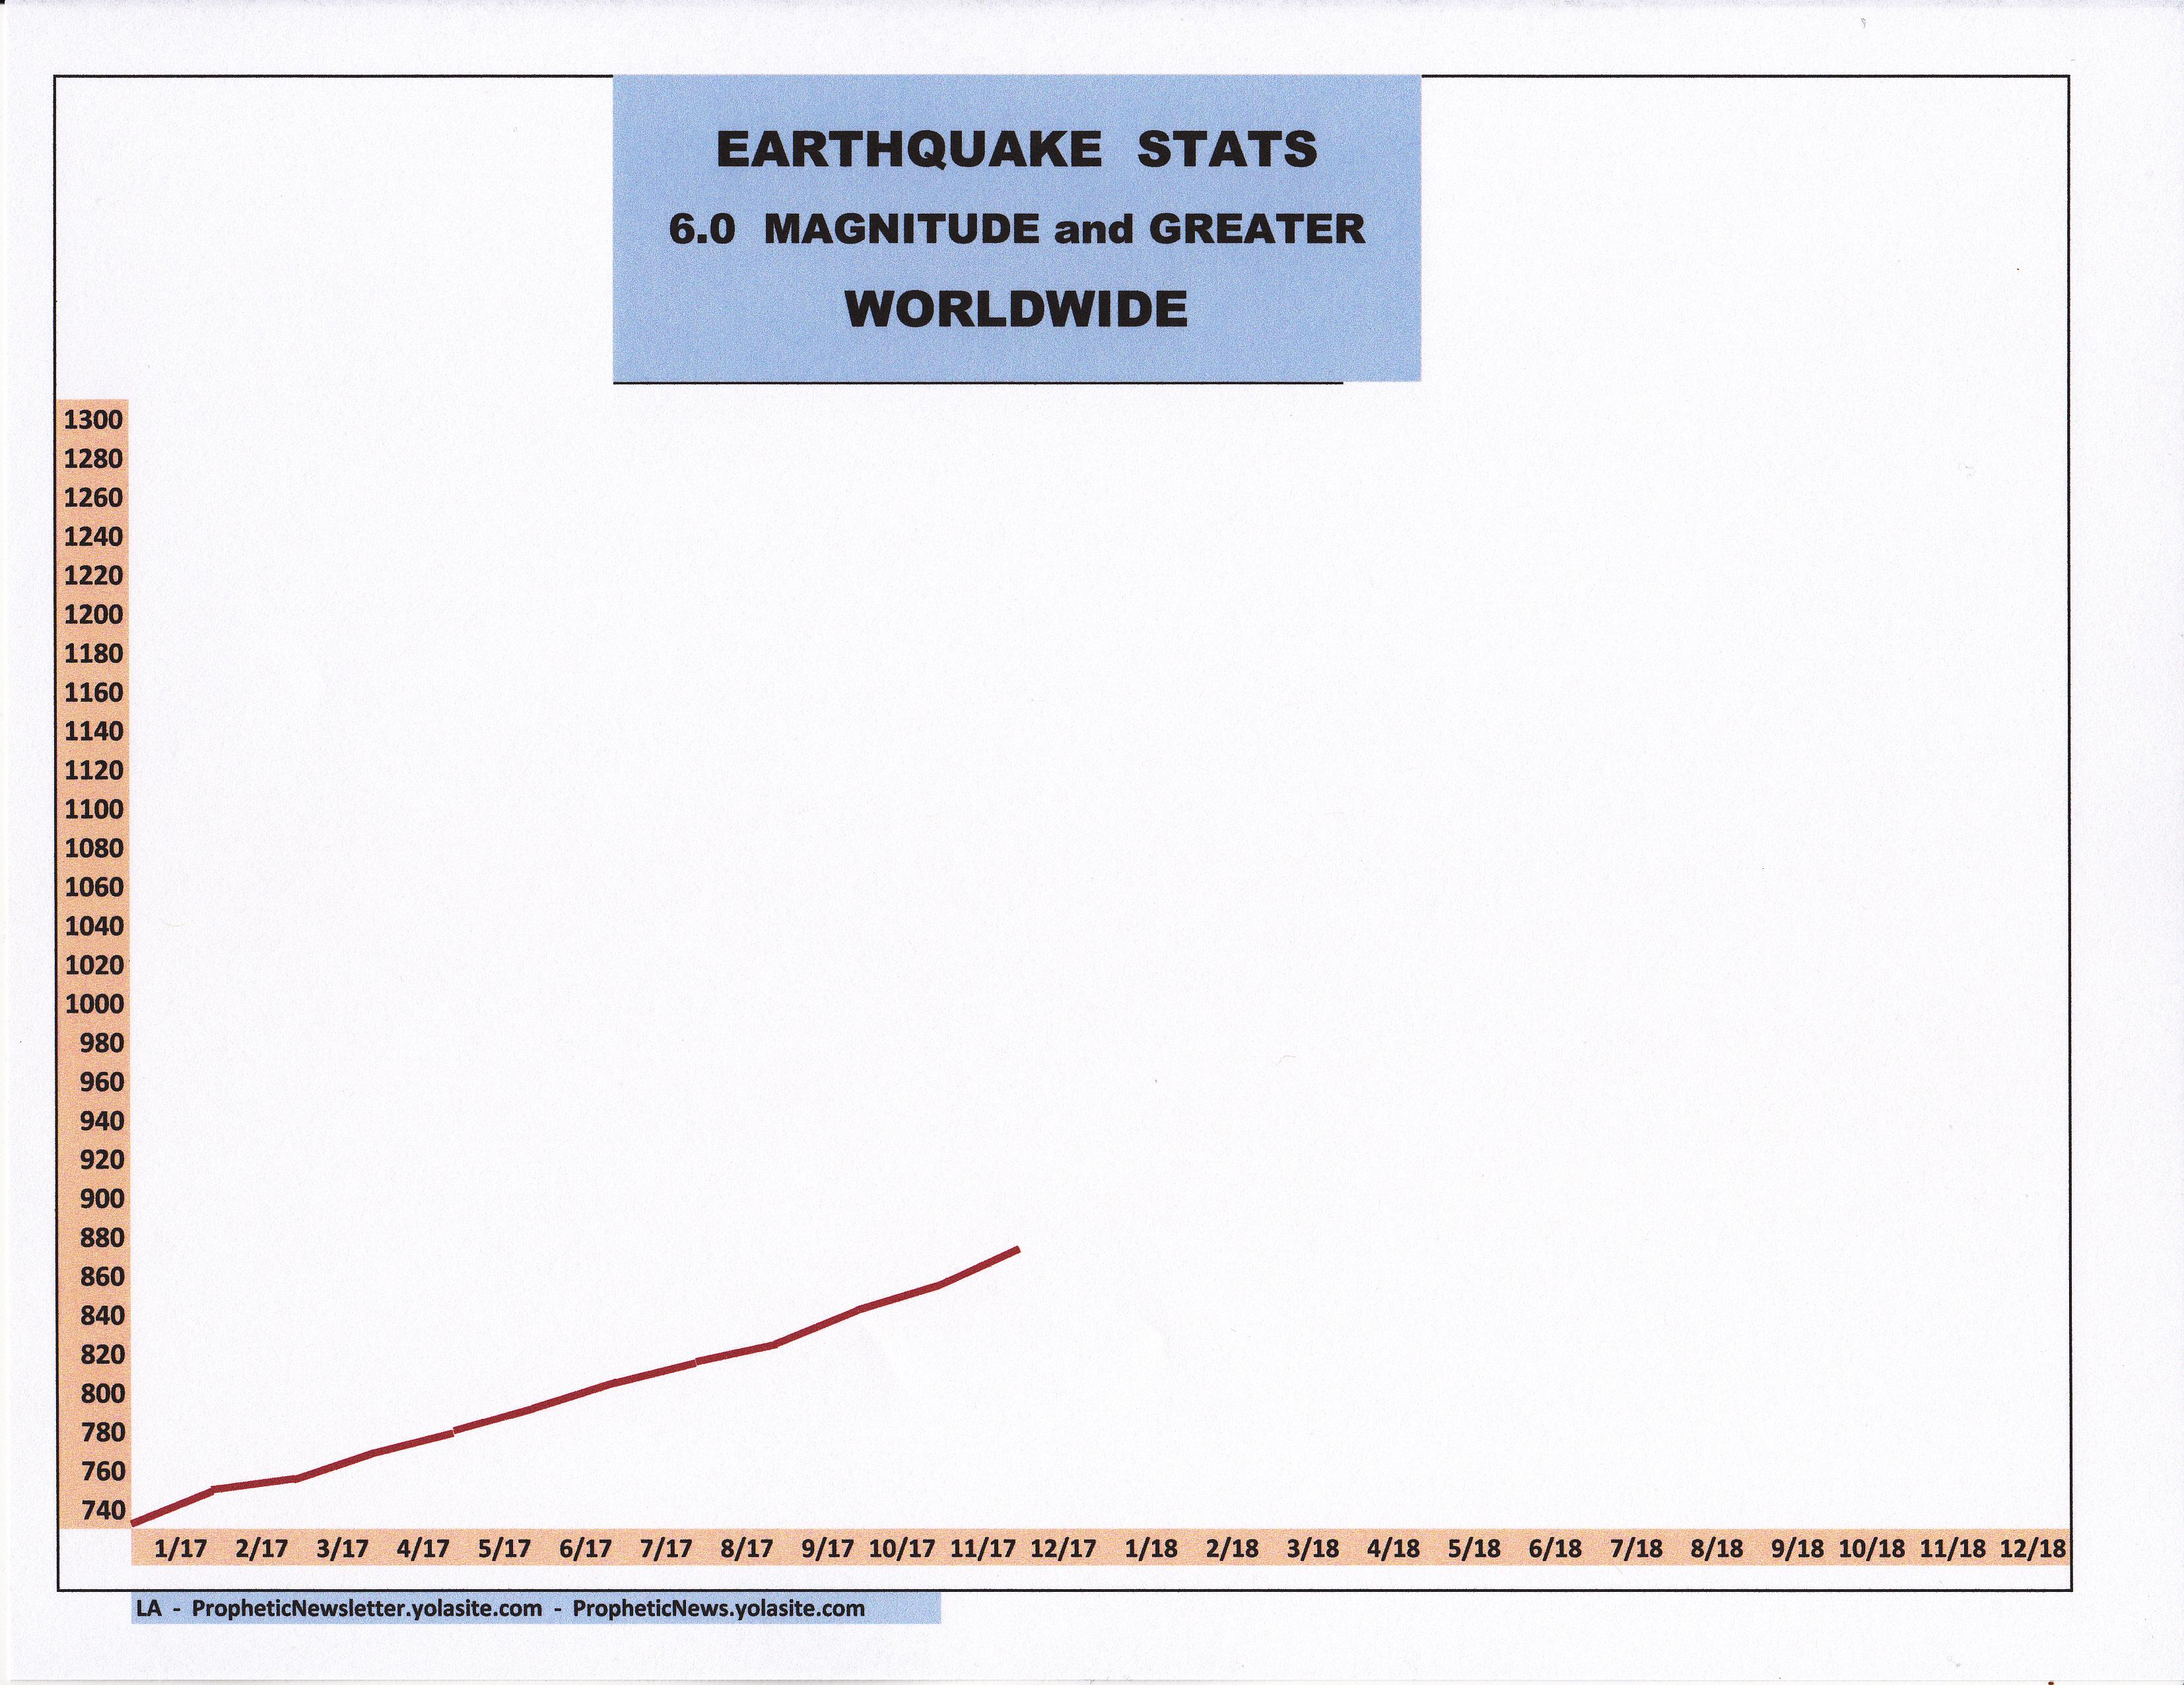 12-17 EARTHQUAKE STATS